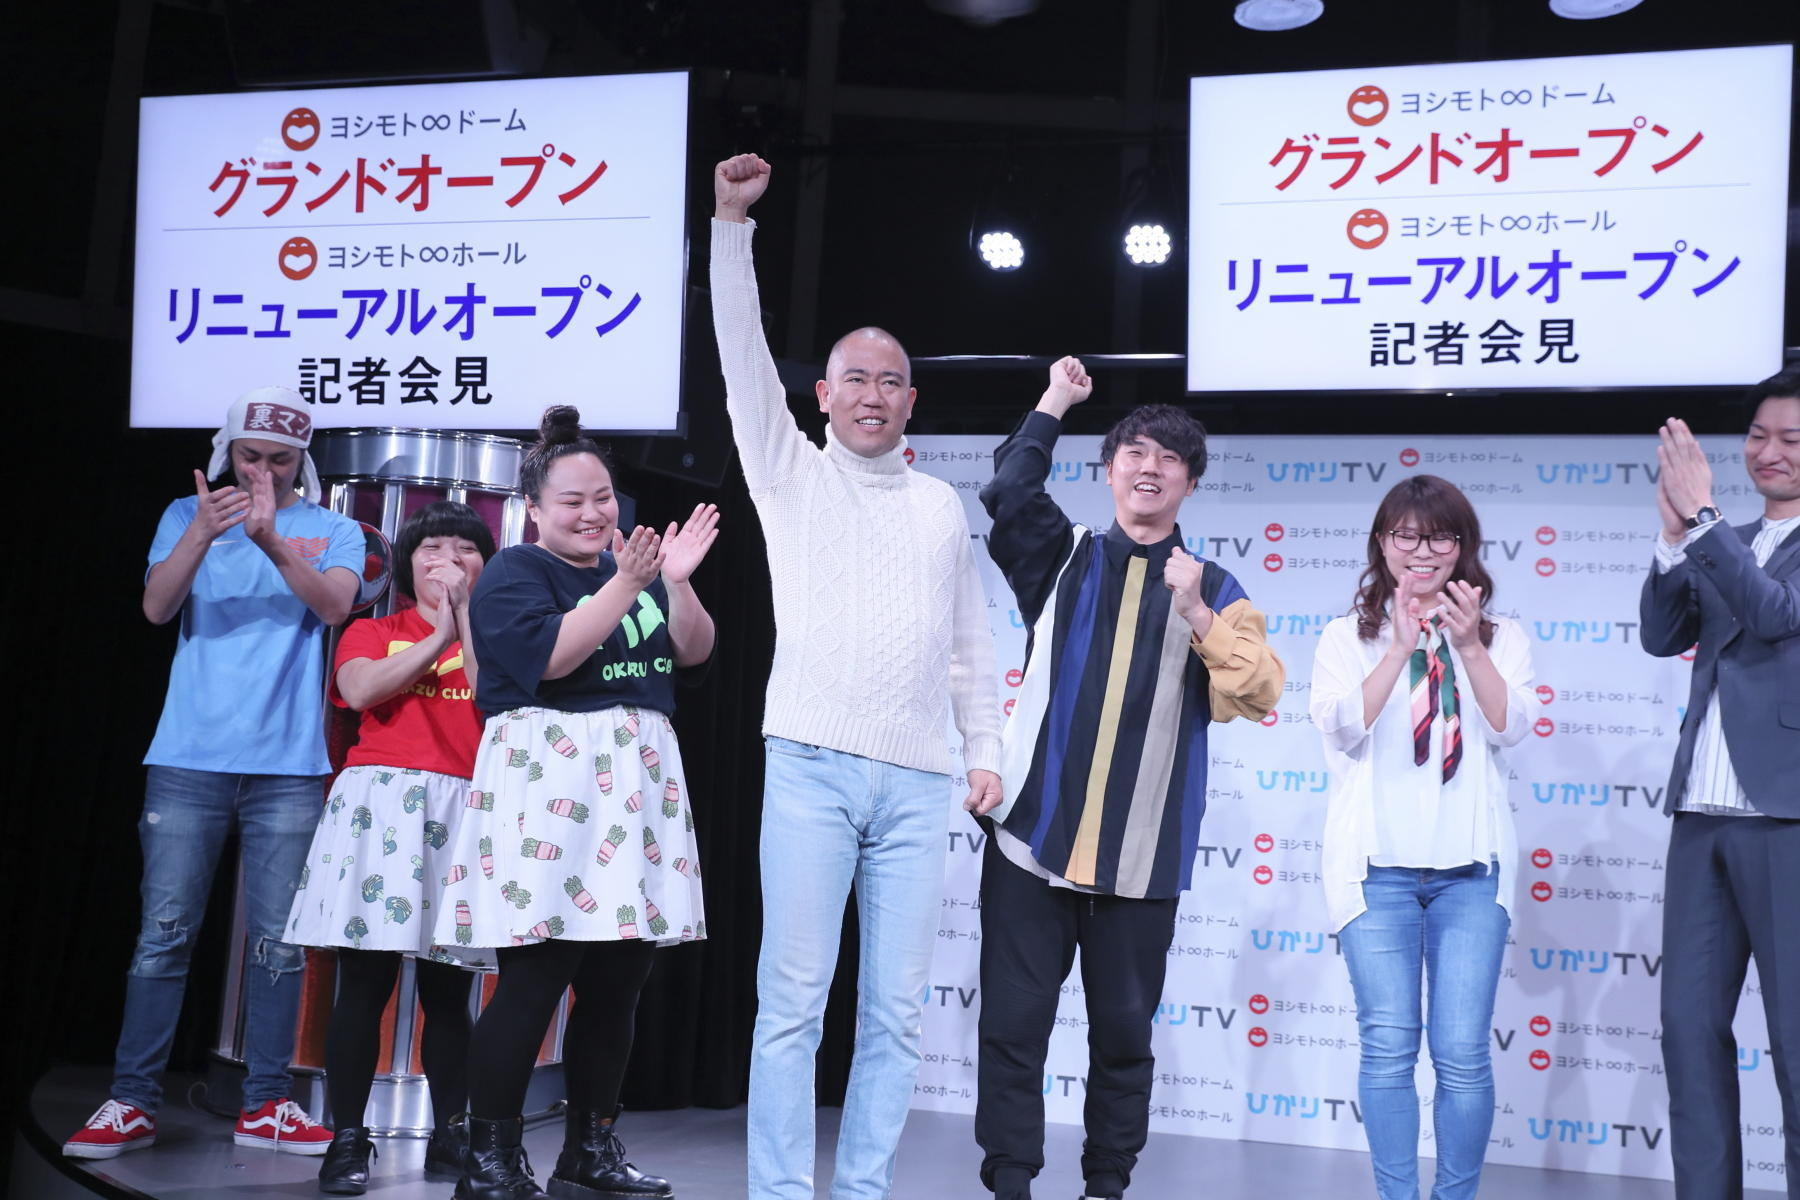 http://news.yoshimoto.co.jp/20181110145441-978ea30c3556665a68227b68fe1a971916f035fa.jpg